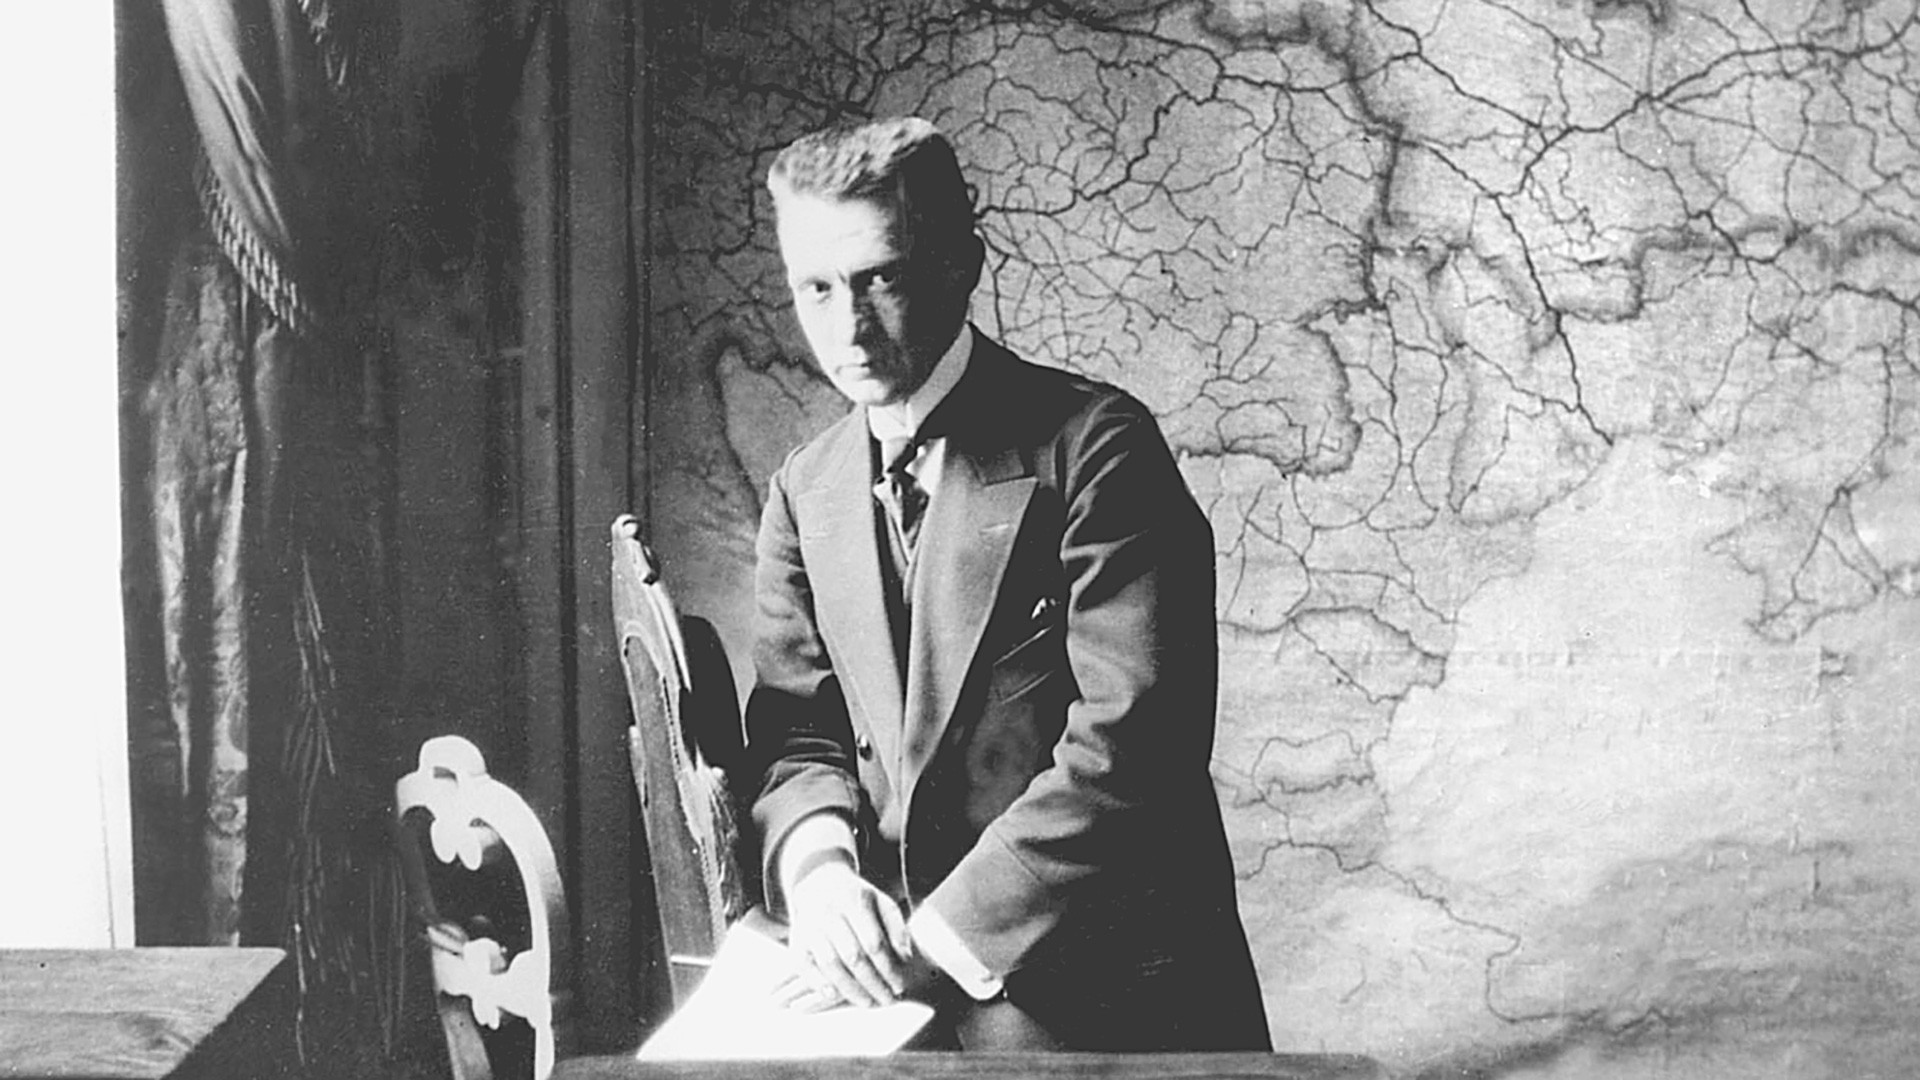 Alexander Kerenski, 1917